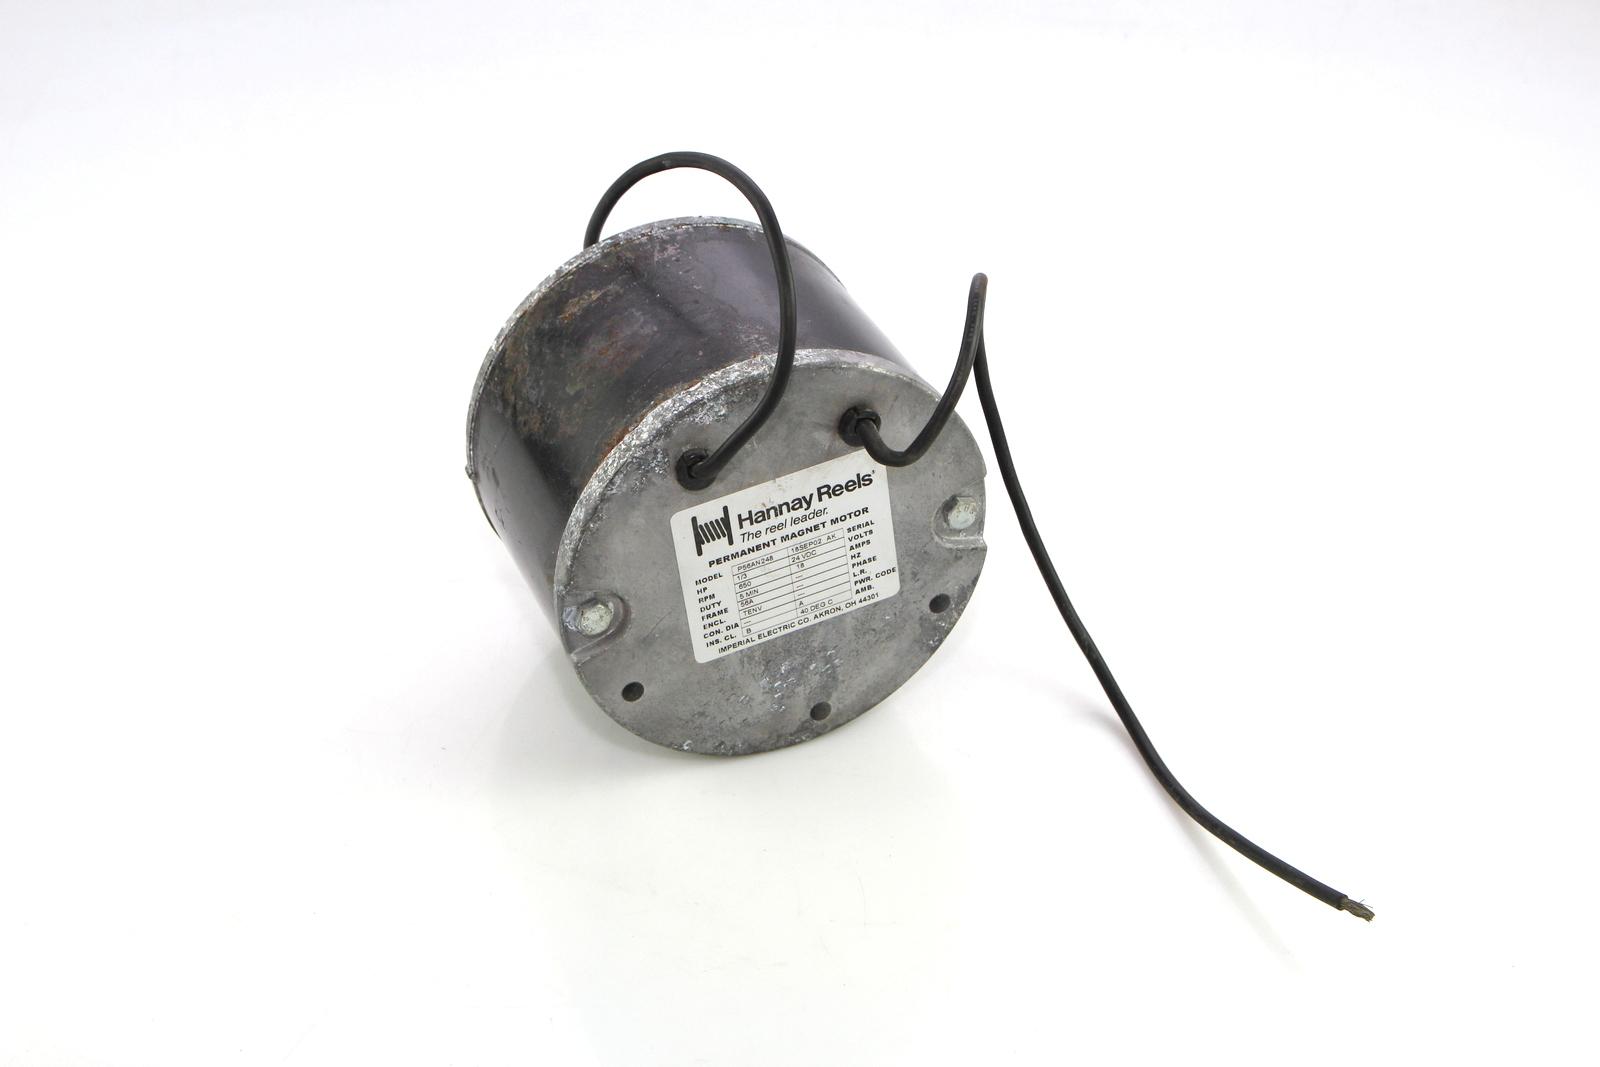 Hannay reels permanent magnet motor p56an248 650rpm 1 3hp for Ebay motors warehouse in billings montana